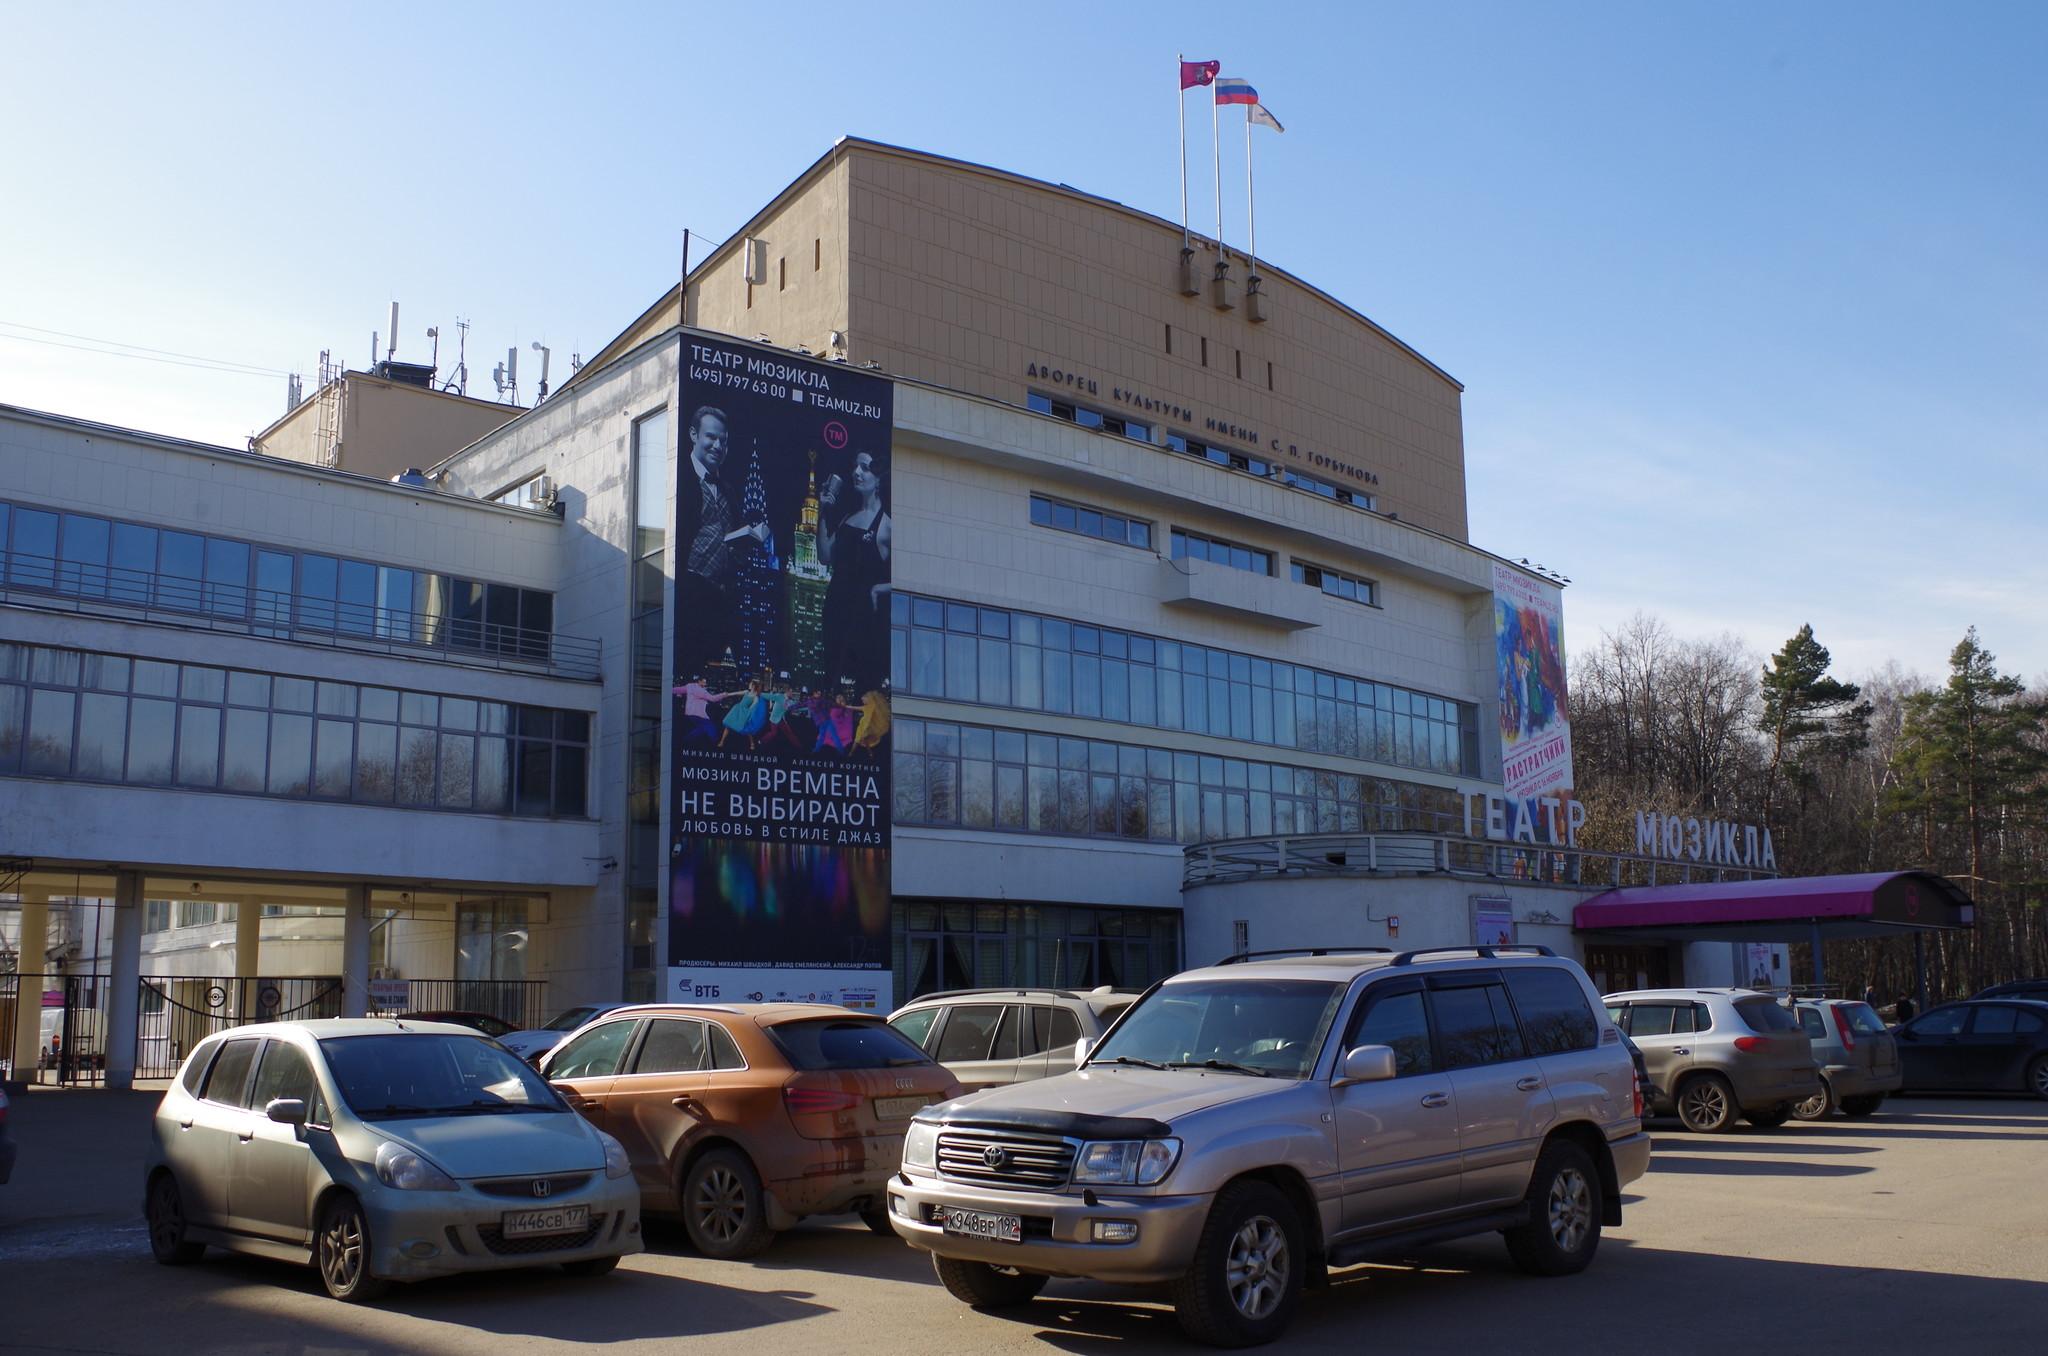 Дворец культуры имени С.П. Горбунова